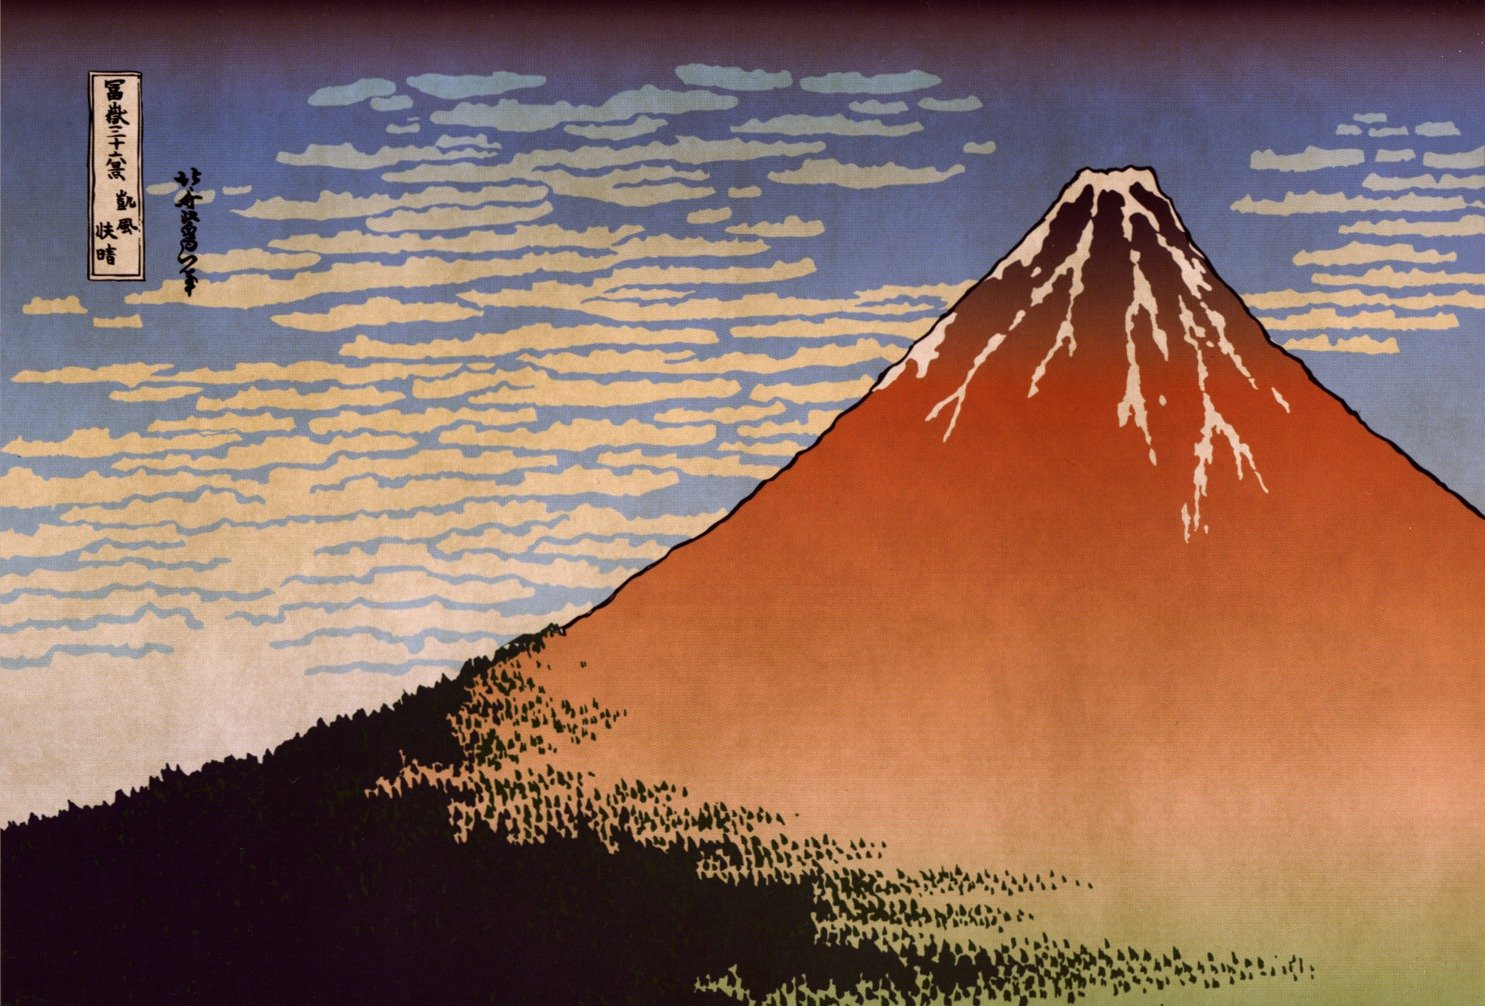 estampe de hokusai du mont fuji Wallpaper   ForWallpapercom 1485x1006